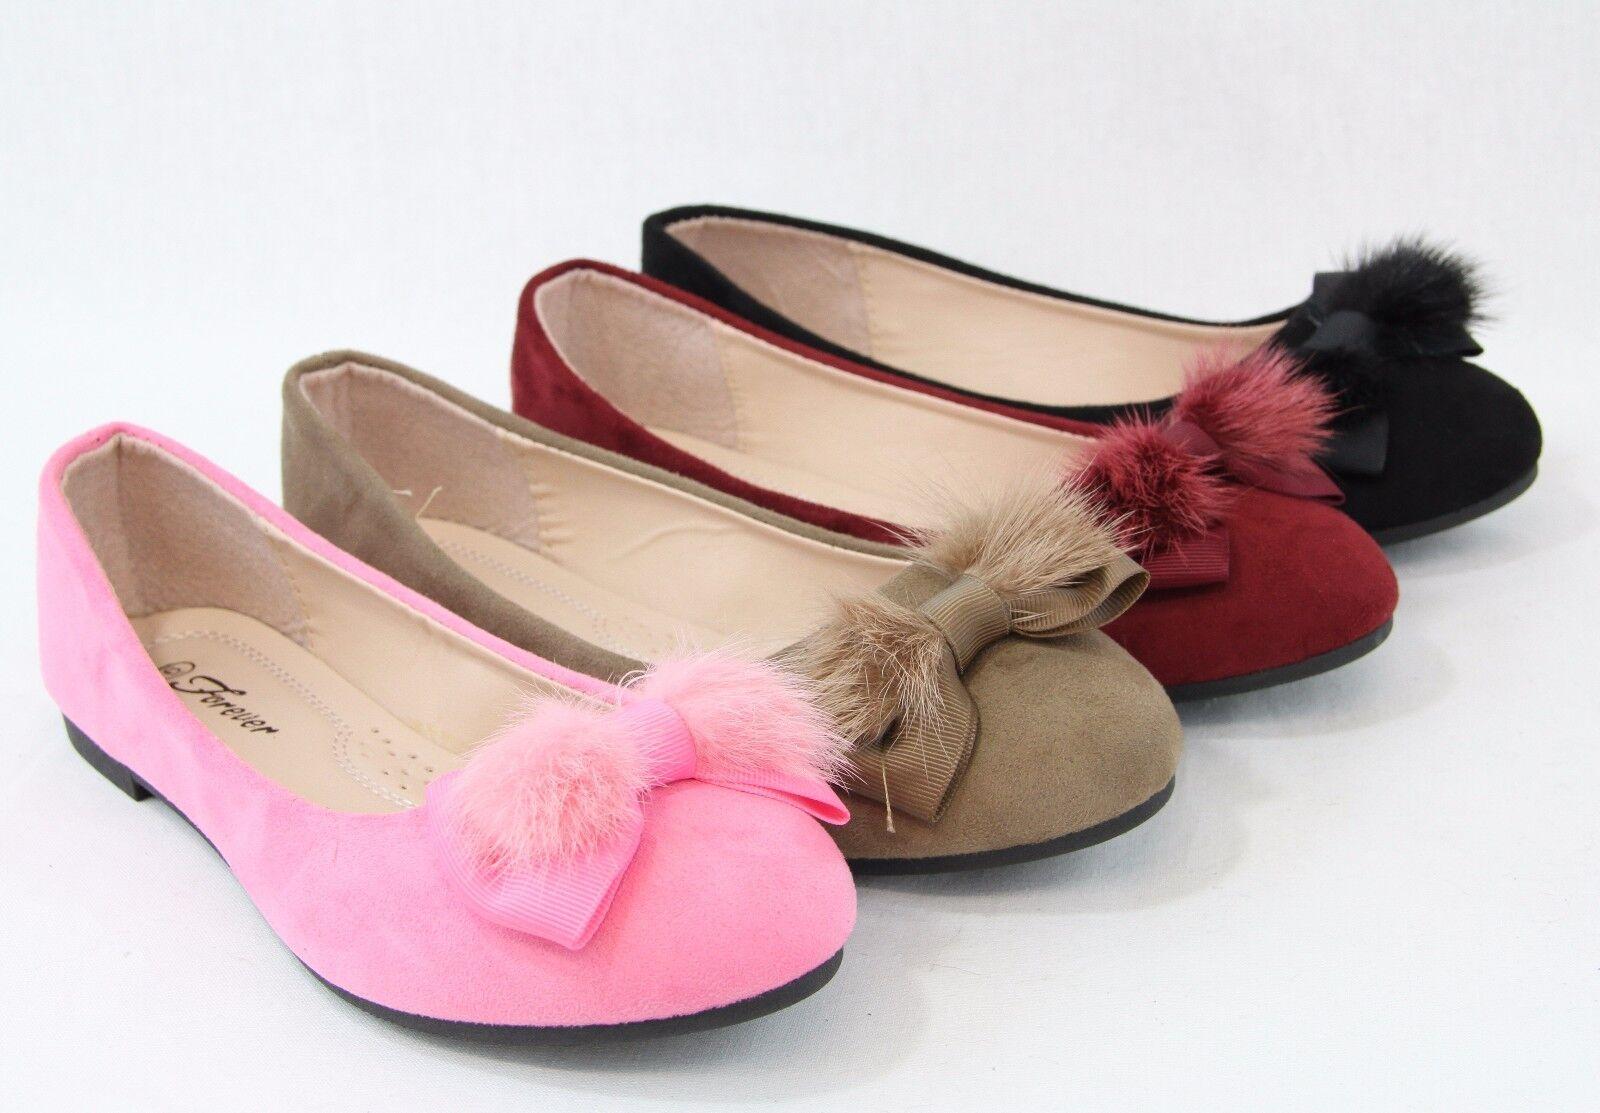 Cute Women Comfortable Ballet Flat With Bow Fur Design Comfort shoes Faux Suede